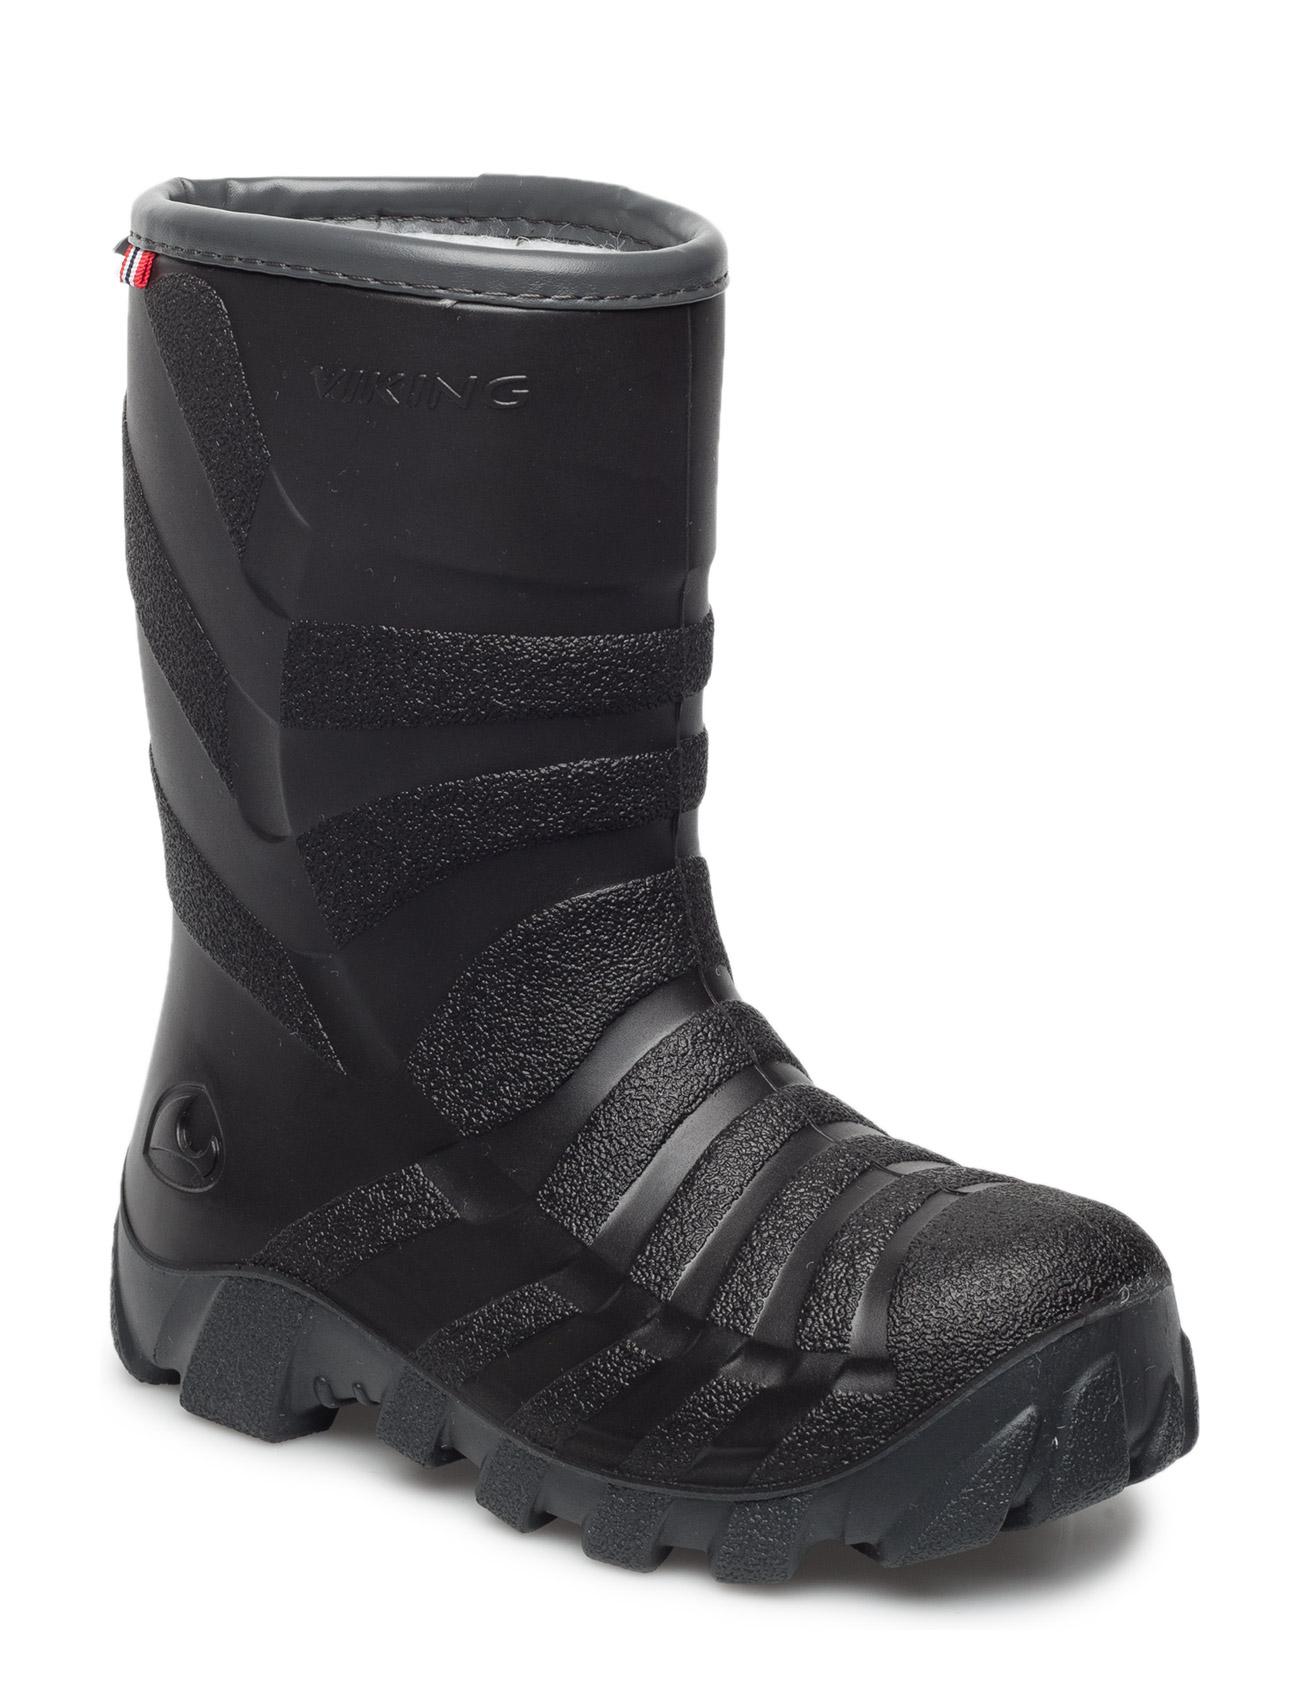 Ultra Viking Støvler til Børn i